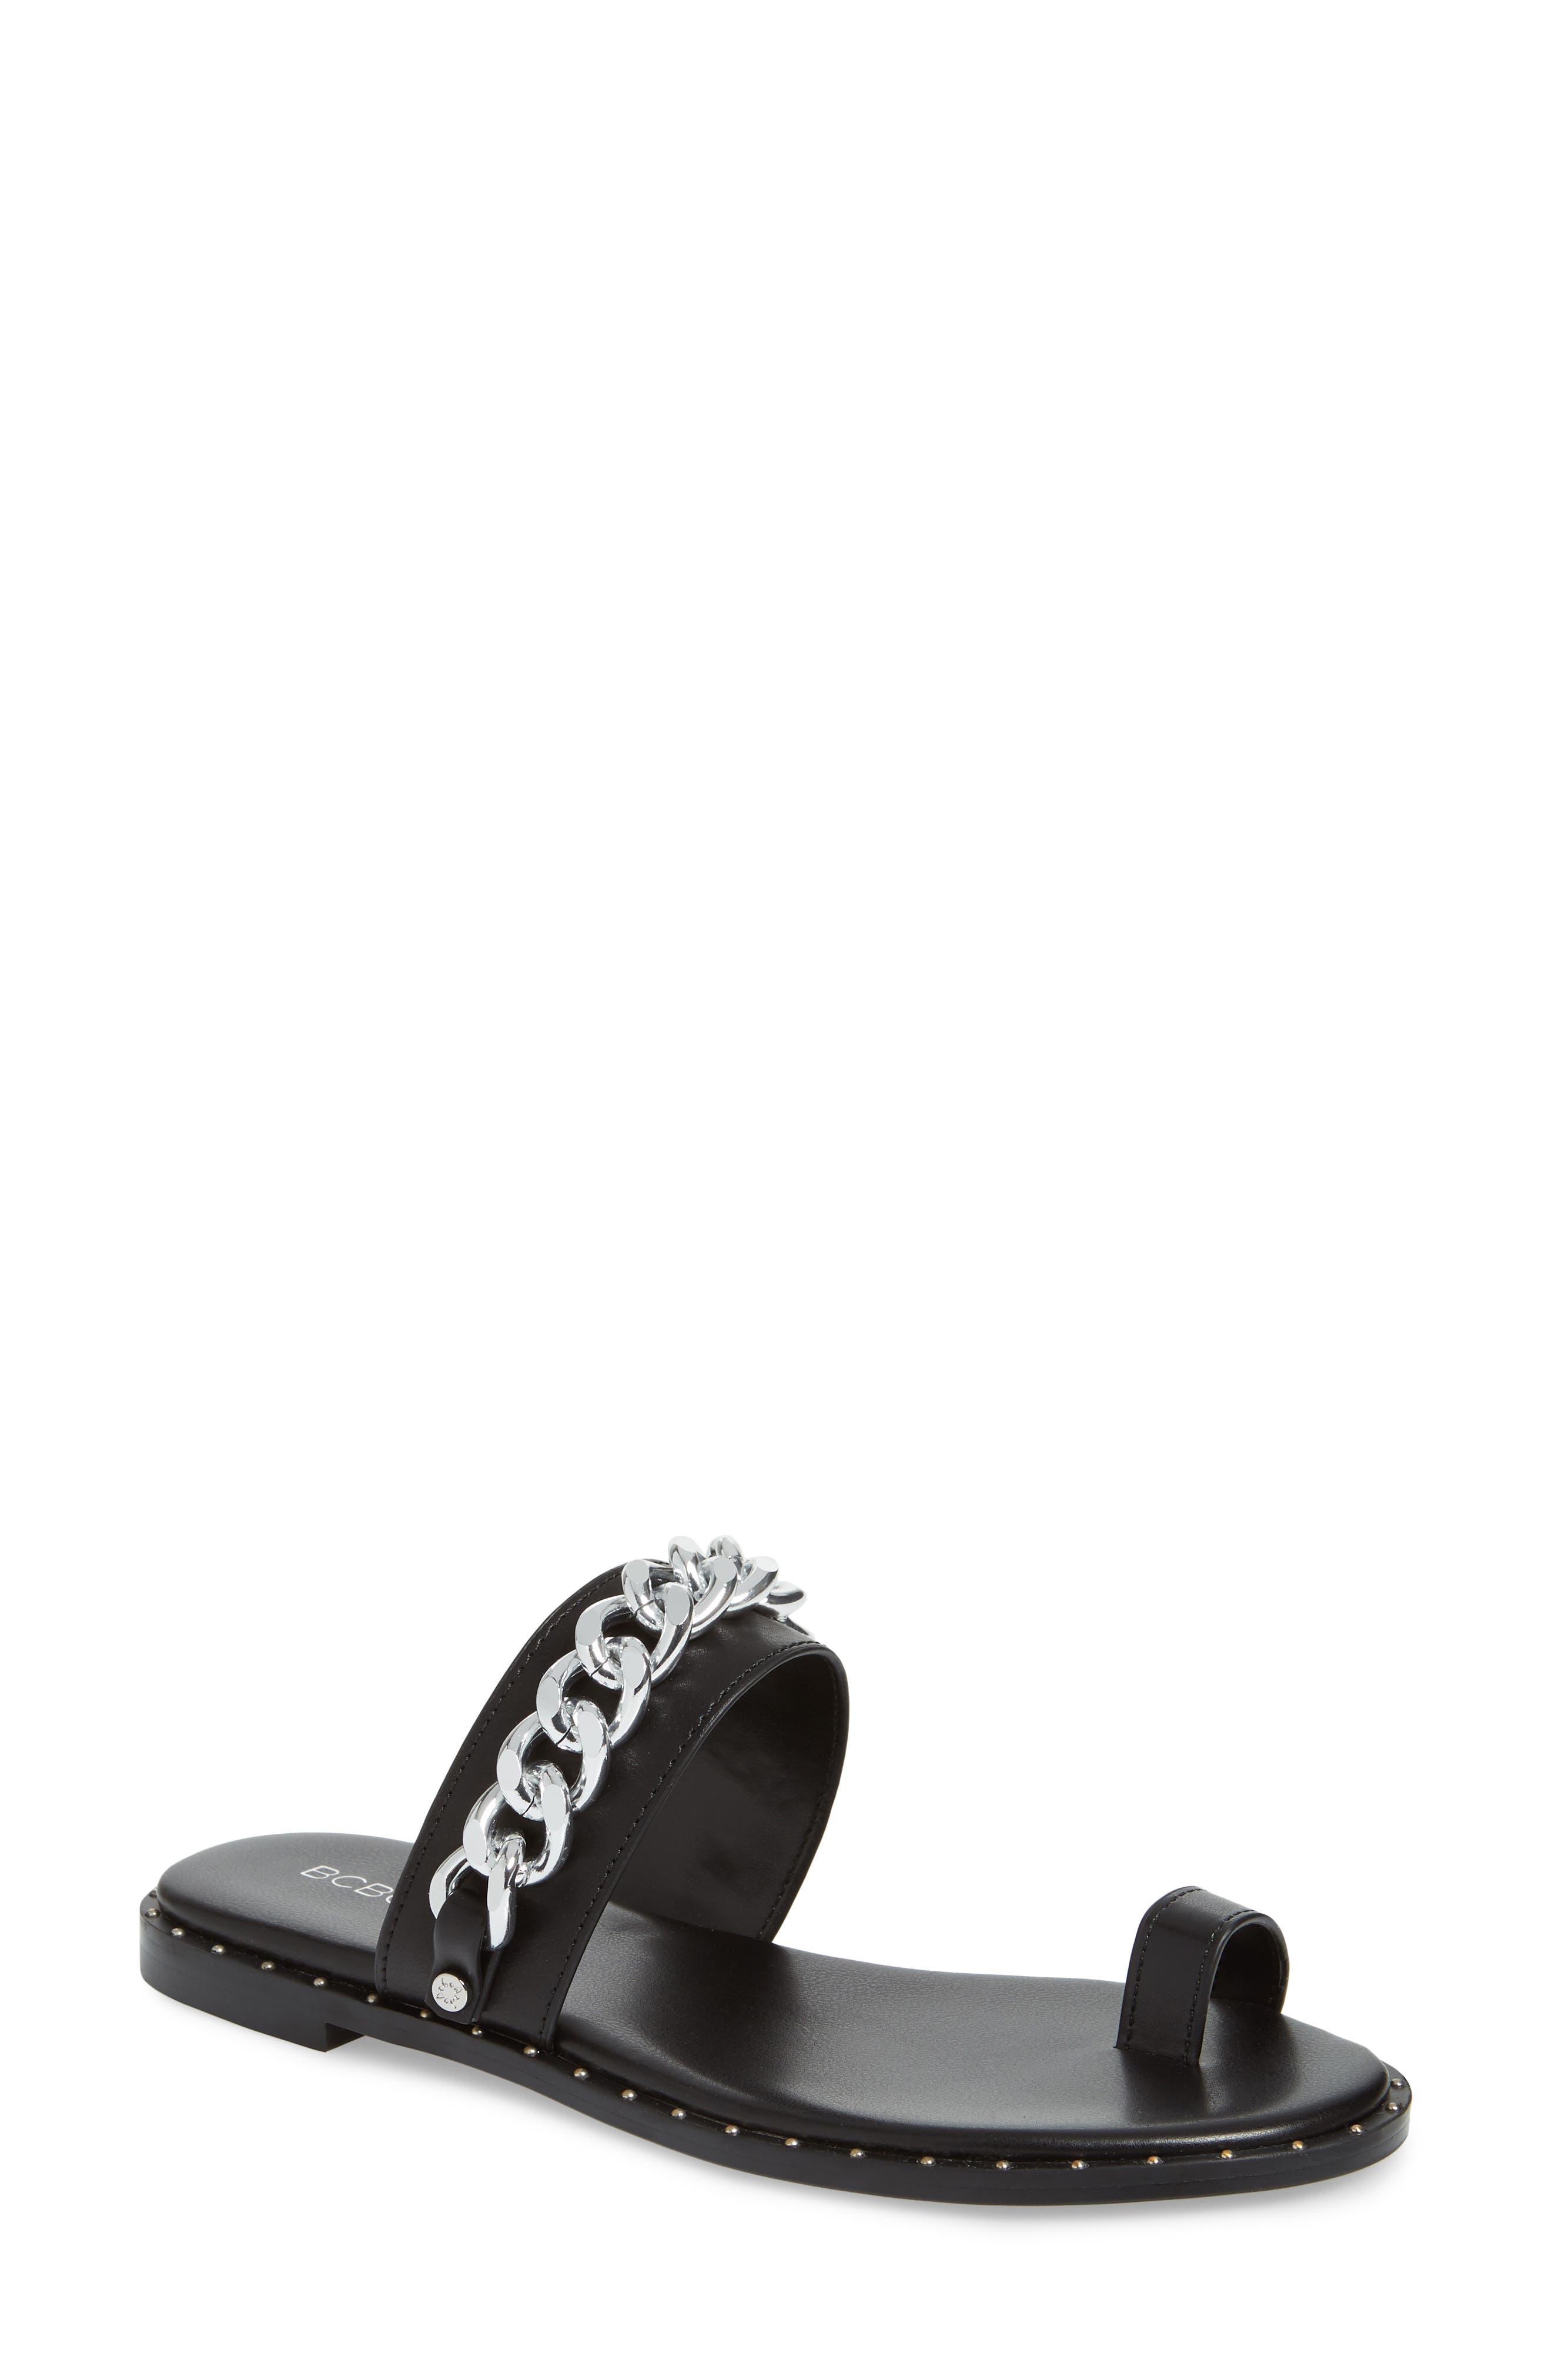 Zola Chain Slide Sandal, Main, color, BLACK